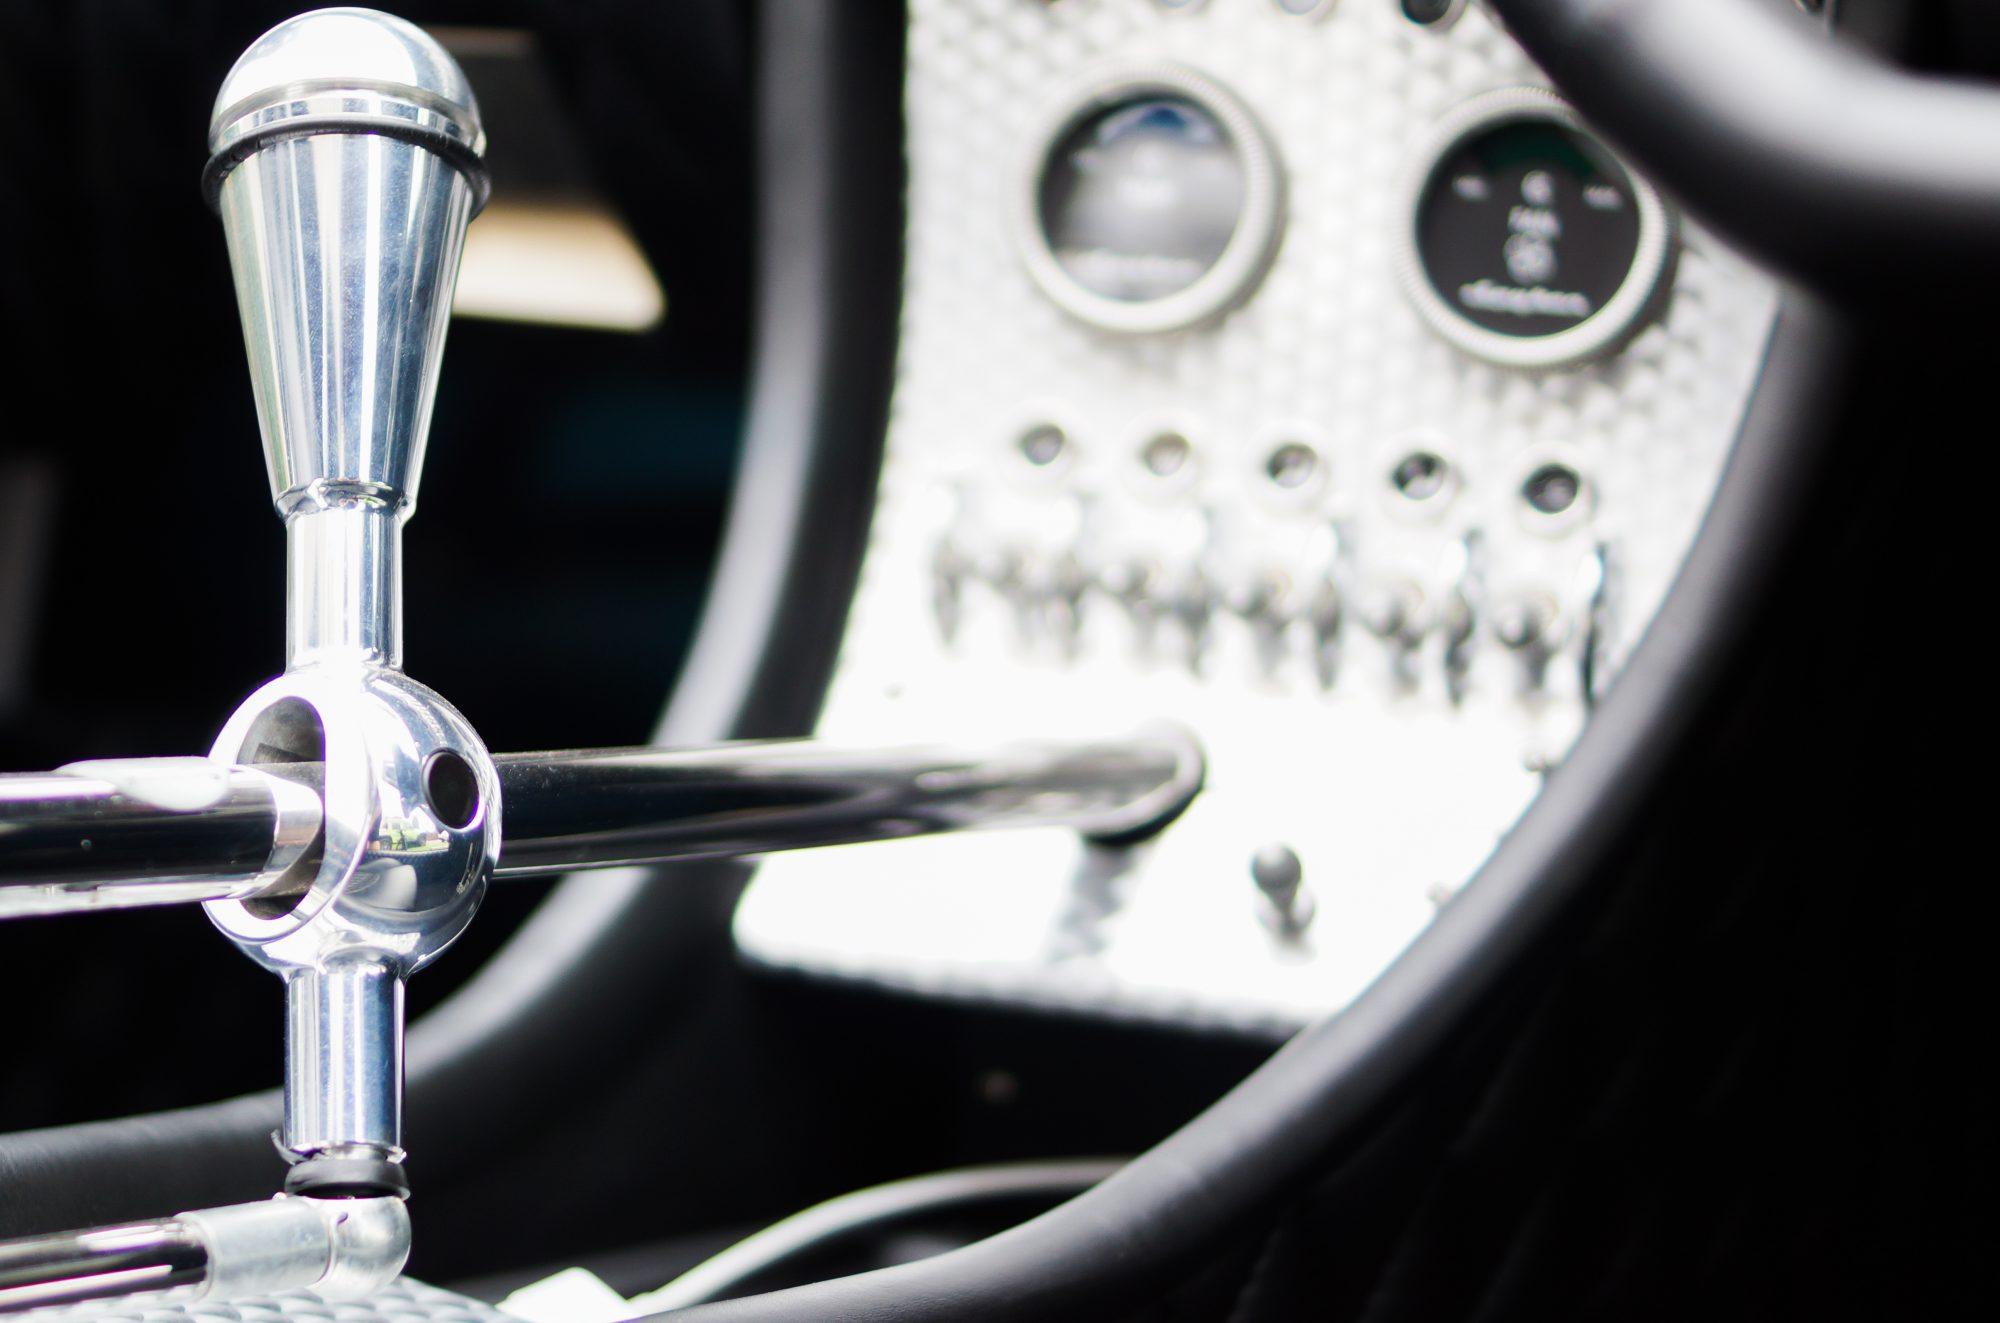 Spyker, Spyker C8, C8, supercar, Audi, V8, classic car, retro car, motoring, automotive, carandclassic, carandclassic.co.uk, kaaimans International